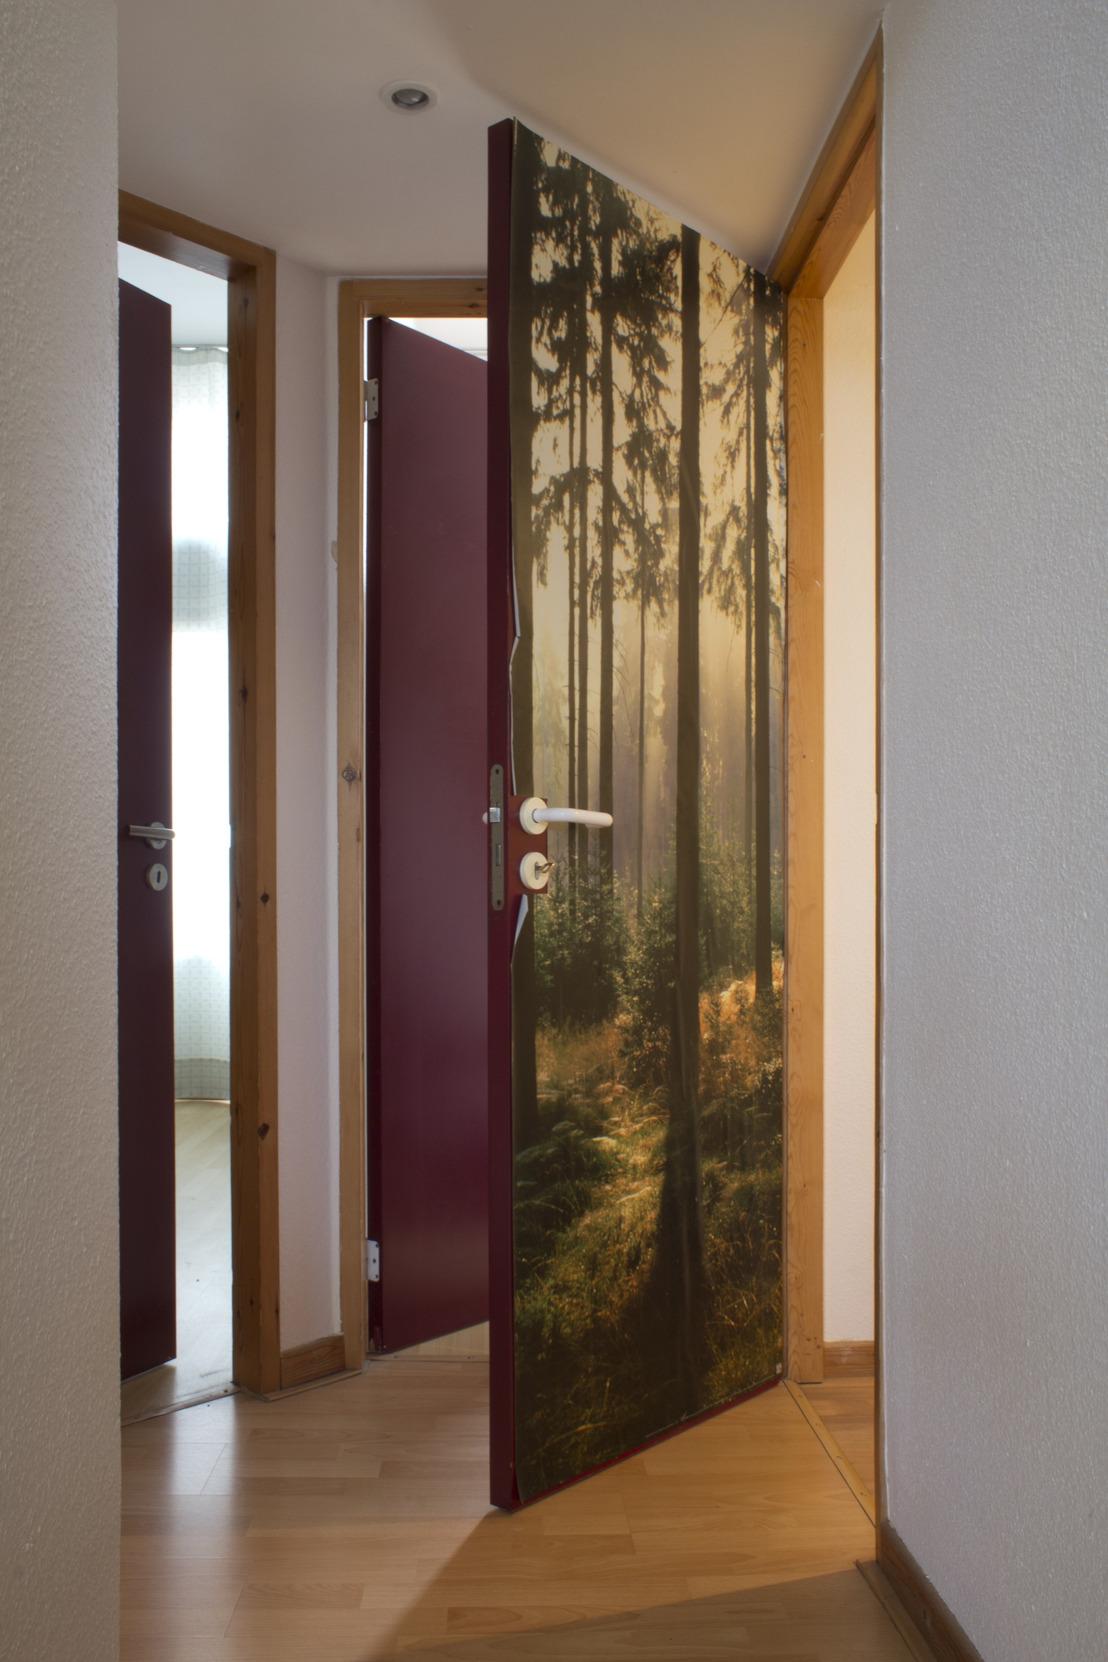 Beursschouwburg Expo: Hans Demeulenaere & Emi Kodama - You make a better door than you do a window